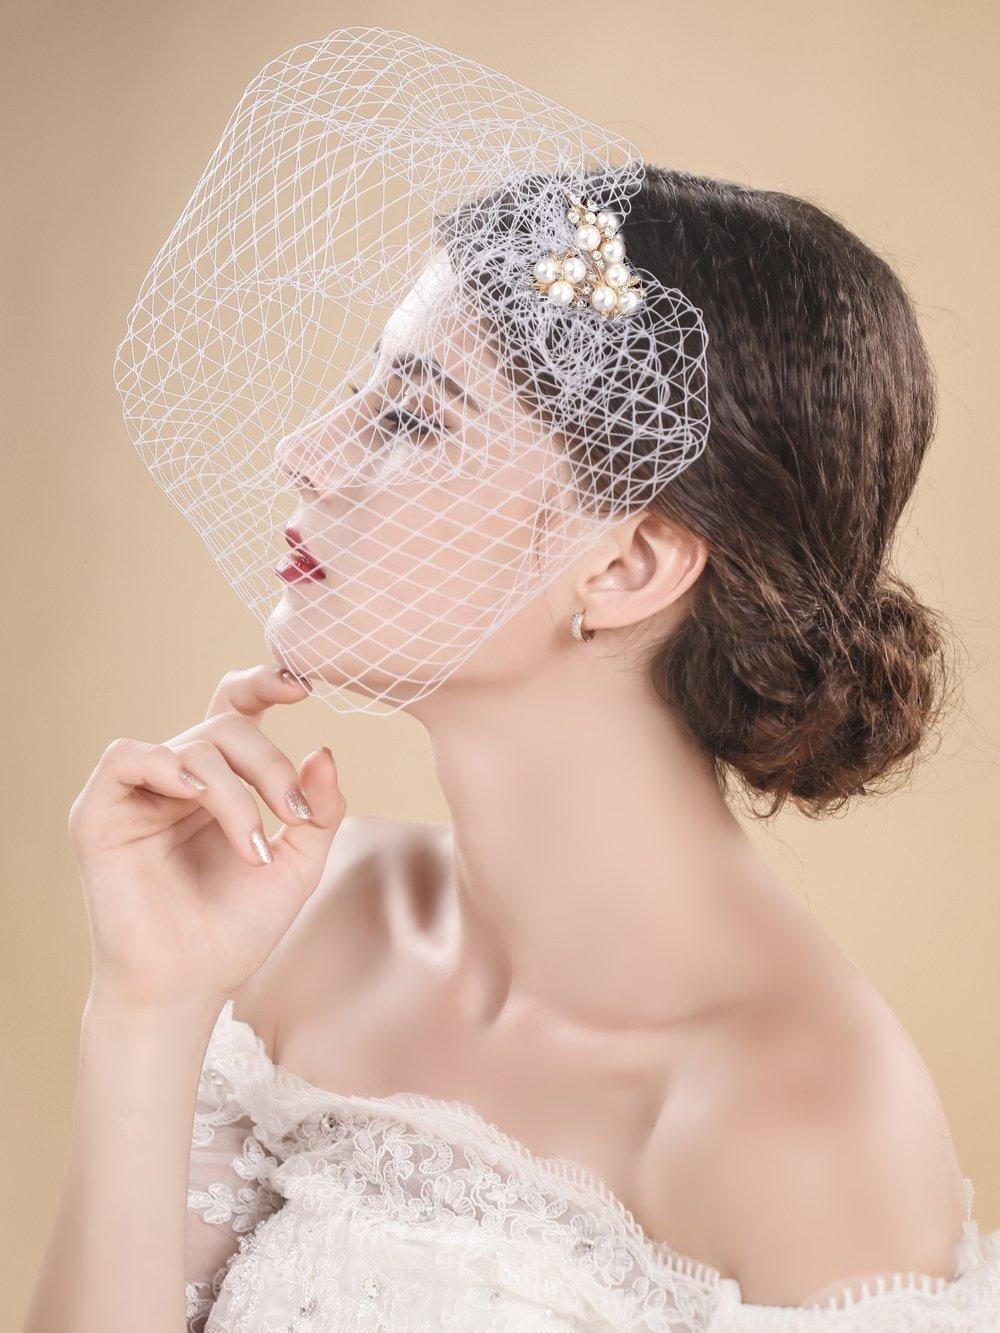 Handcess Wedding Bridcage Veil with Rhinestones Embellishments Comb ...